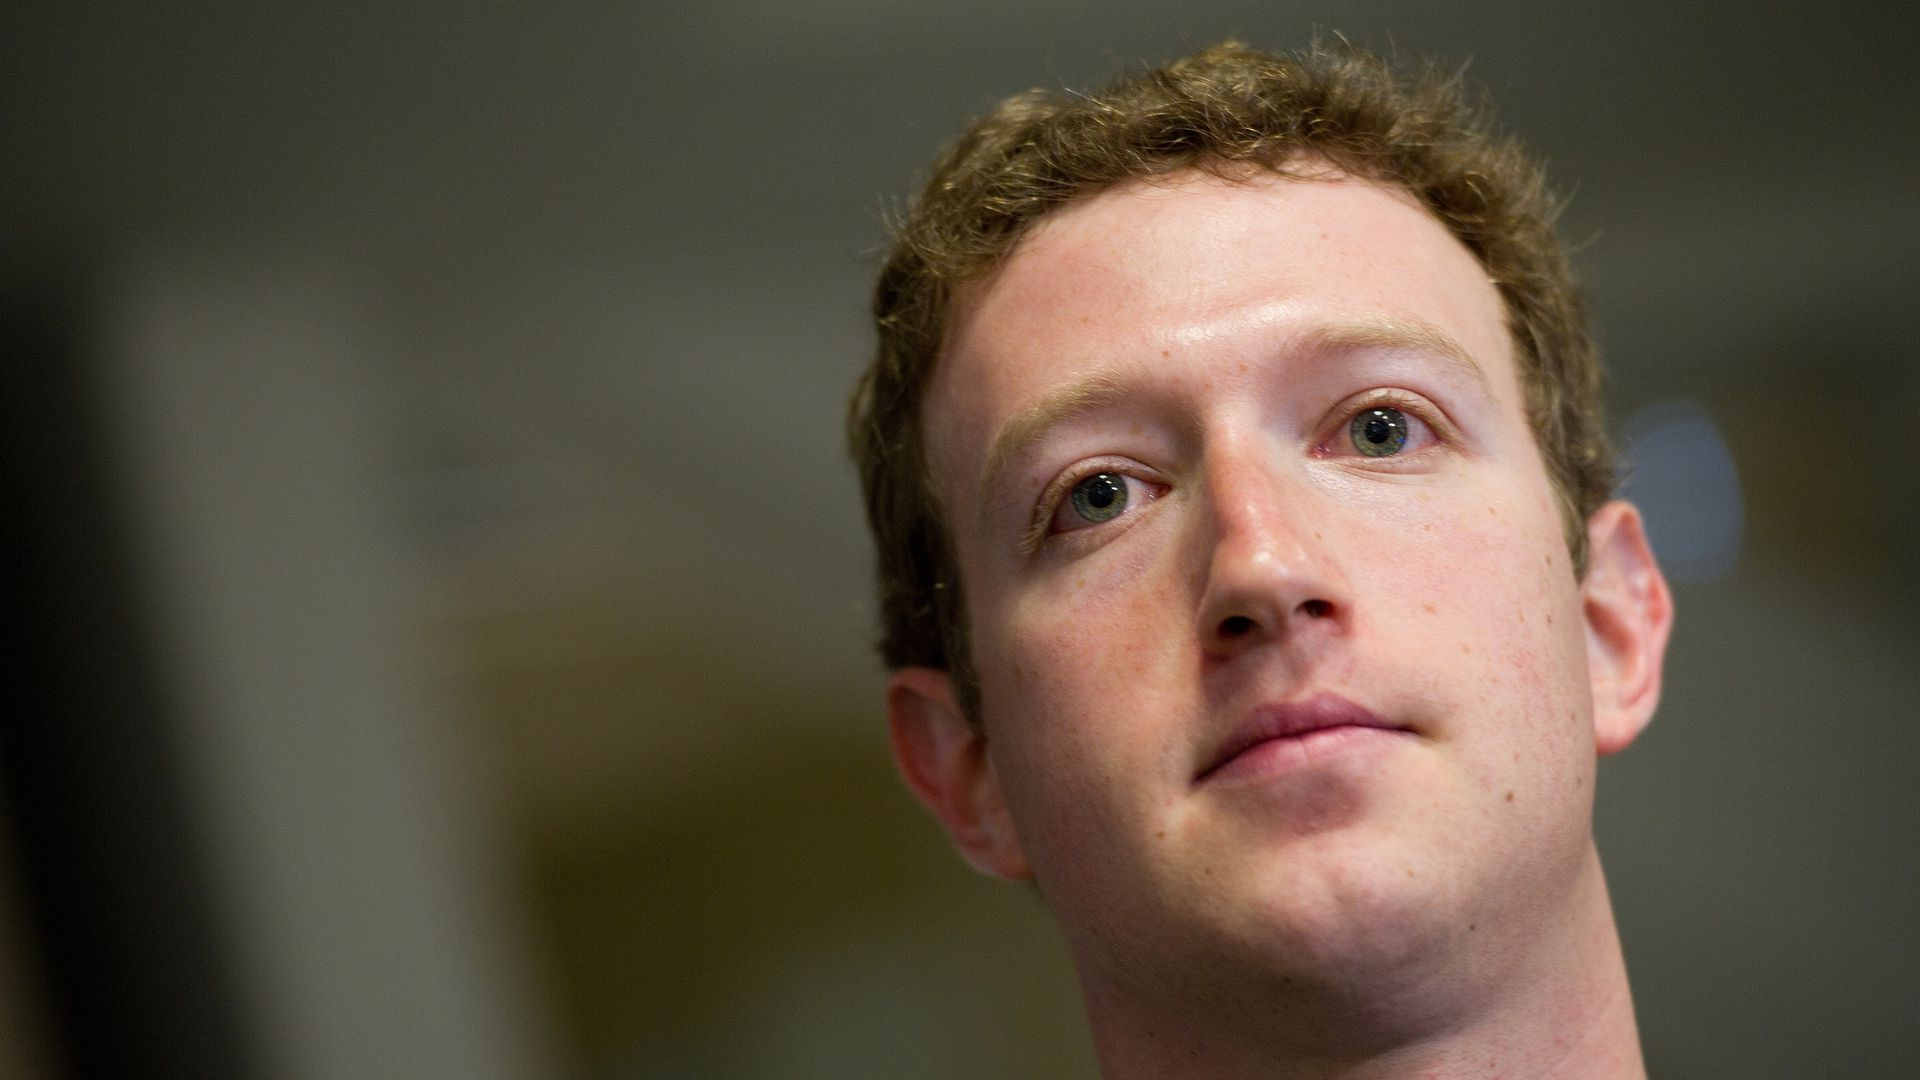 Mark Zuckerberg looks away from the camera